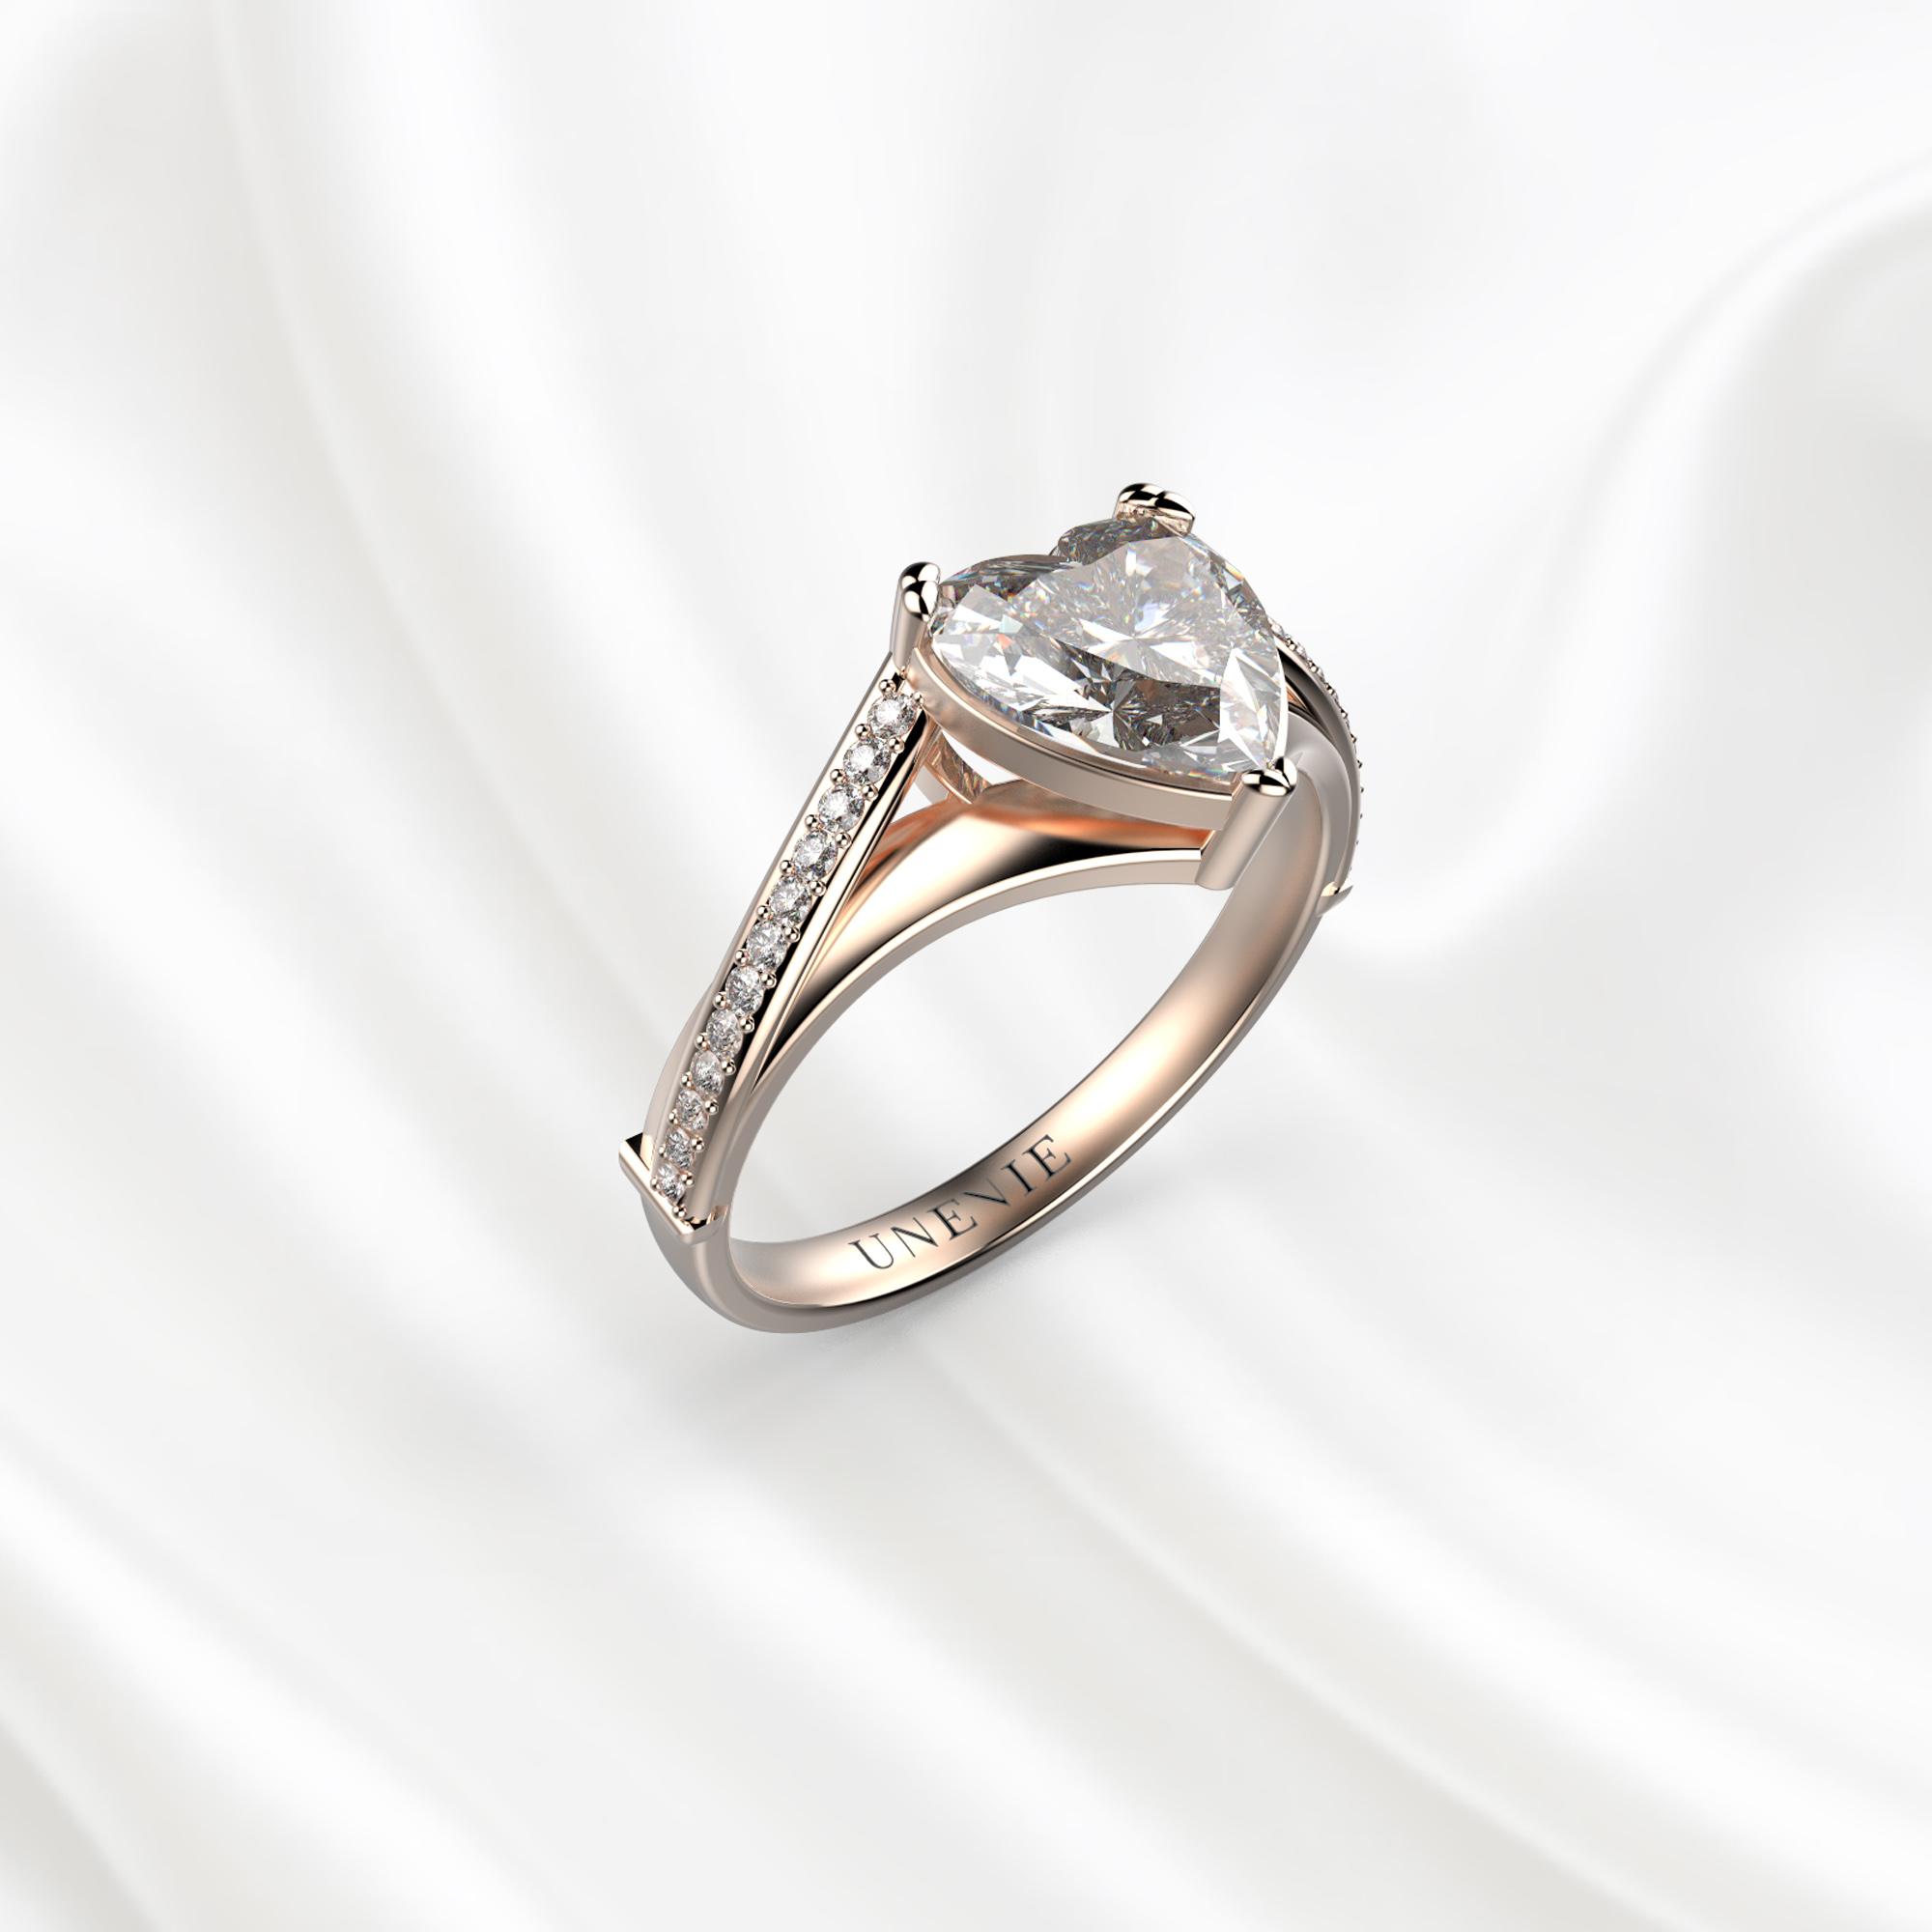 N20 Помолвочное кольцо из розового золота с бриллиантом 0.6 карат